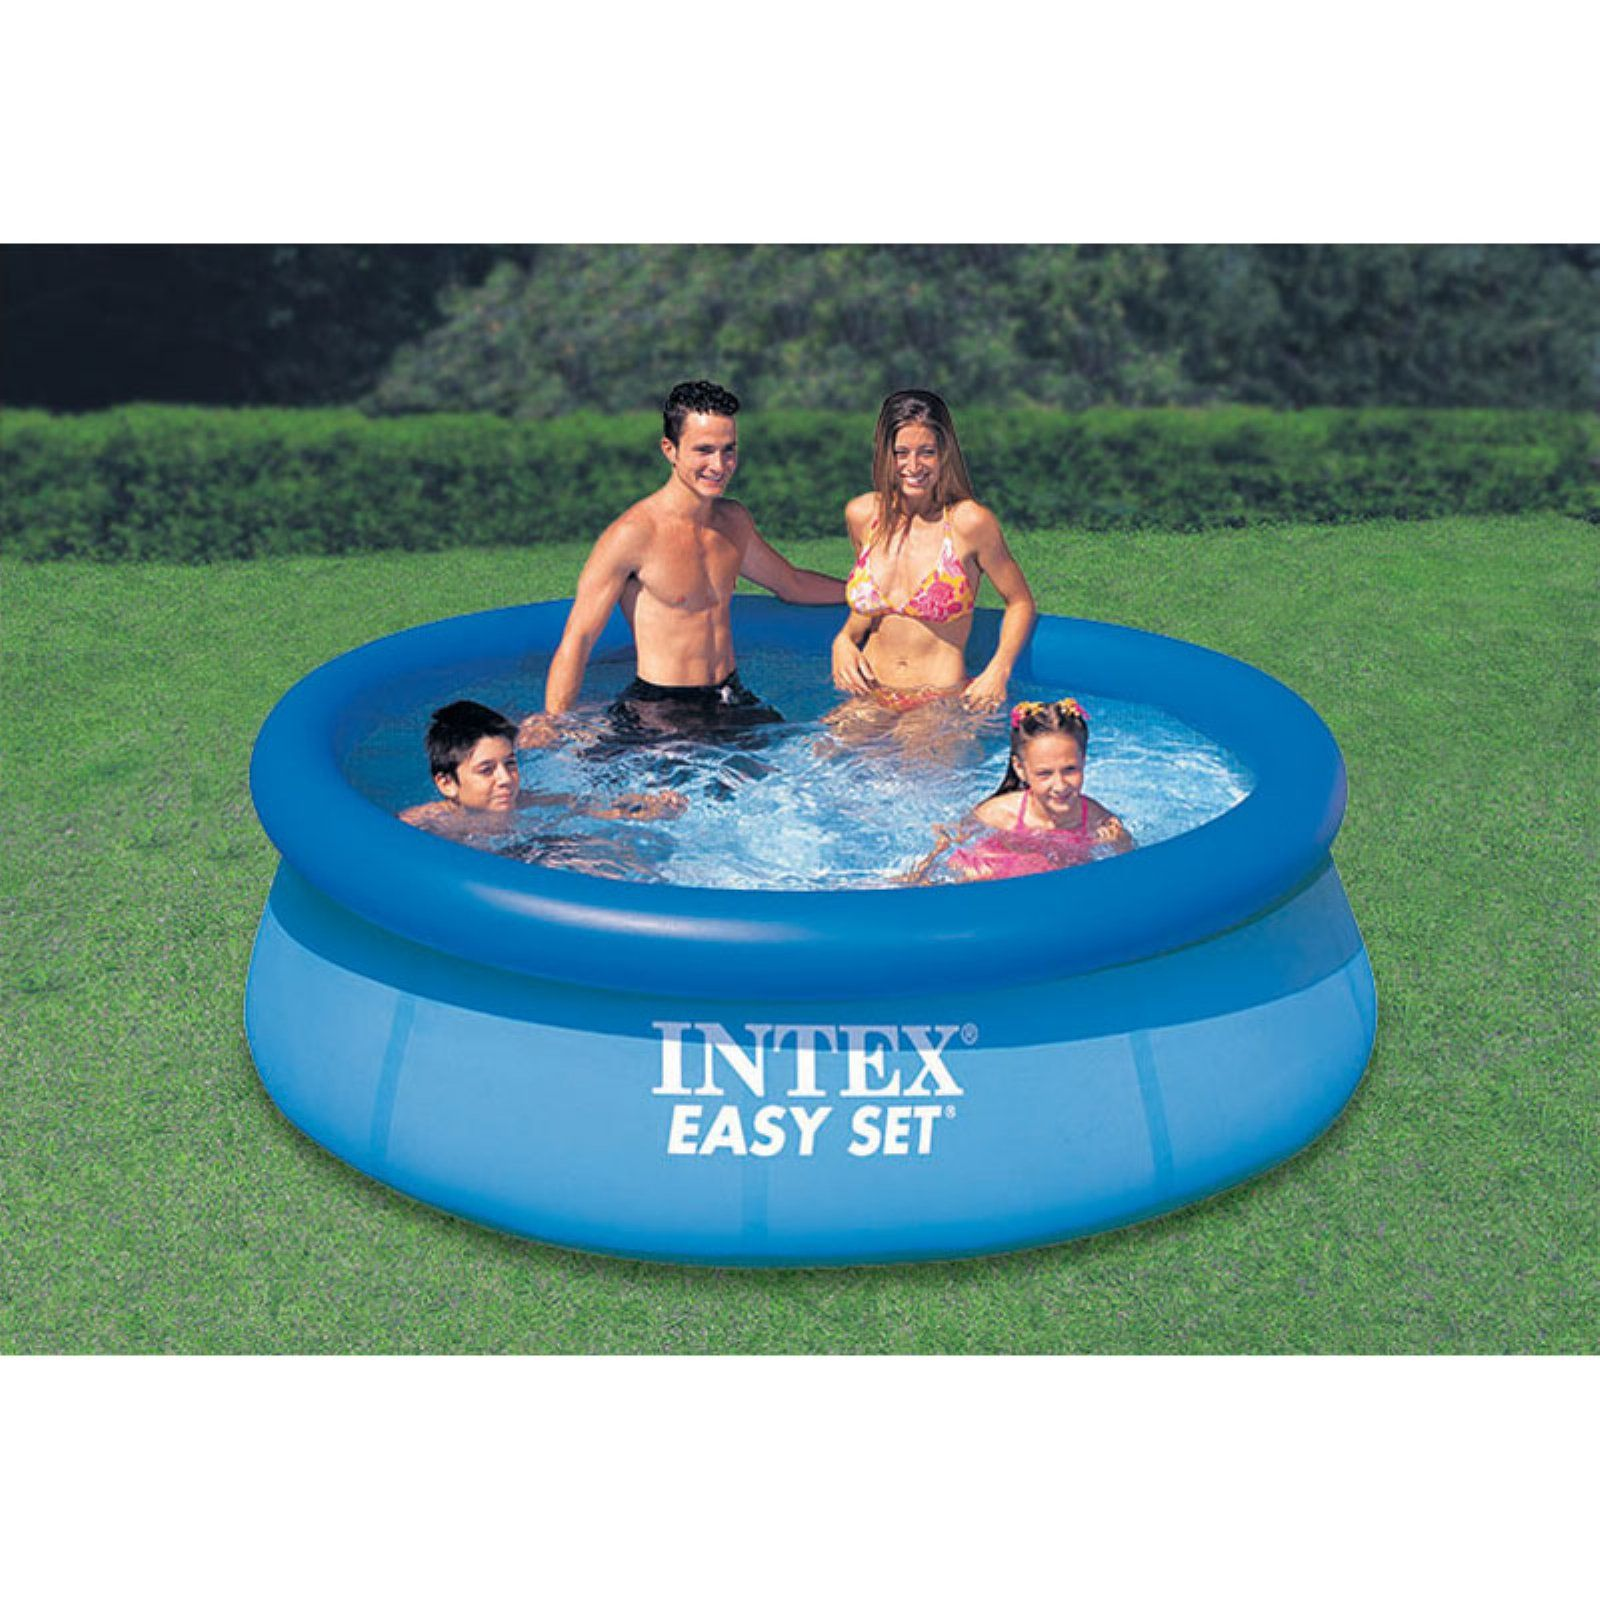 Intex Easy Set Pool   Products in 2019   Easy set pools ...